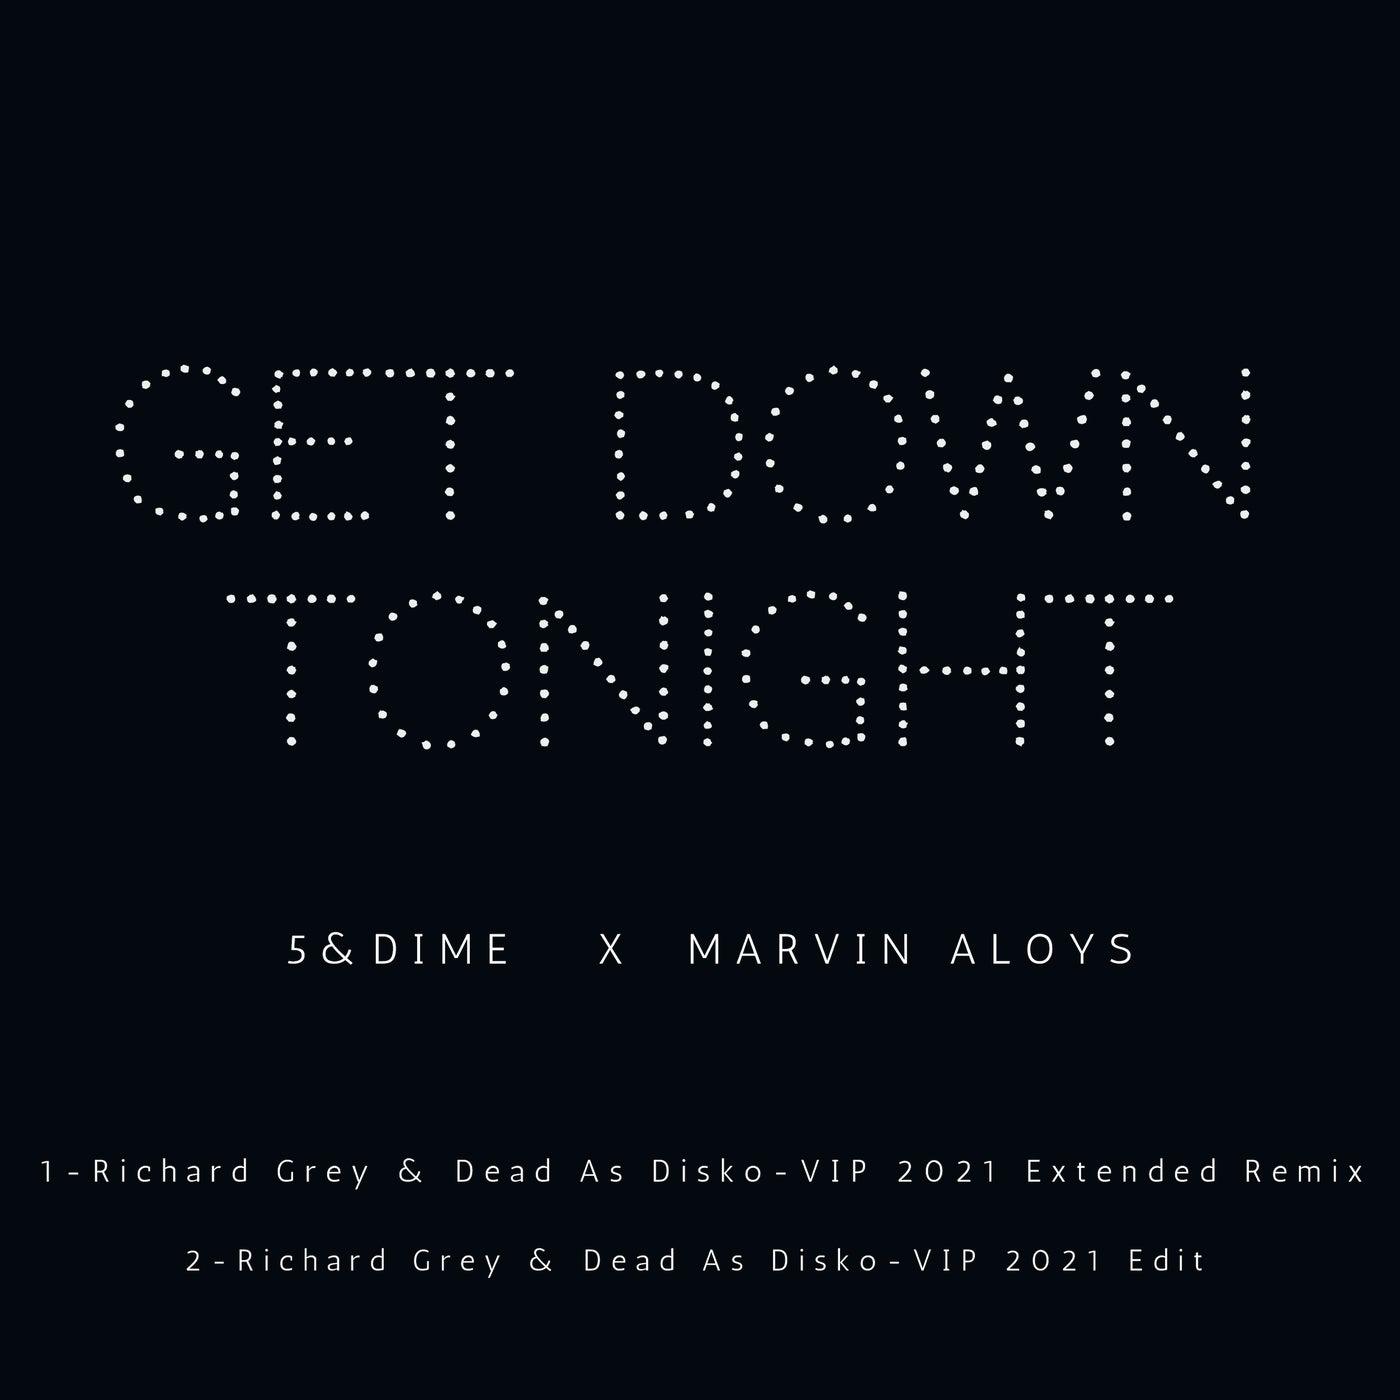 Get Down Tonight (Richard Grey & Dead As Disko VIP 2021 Remix Extended)